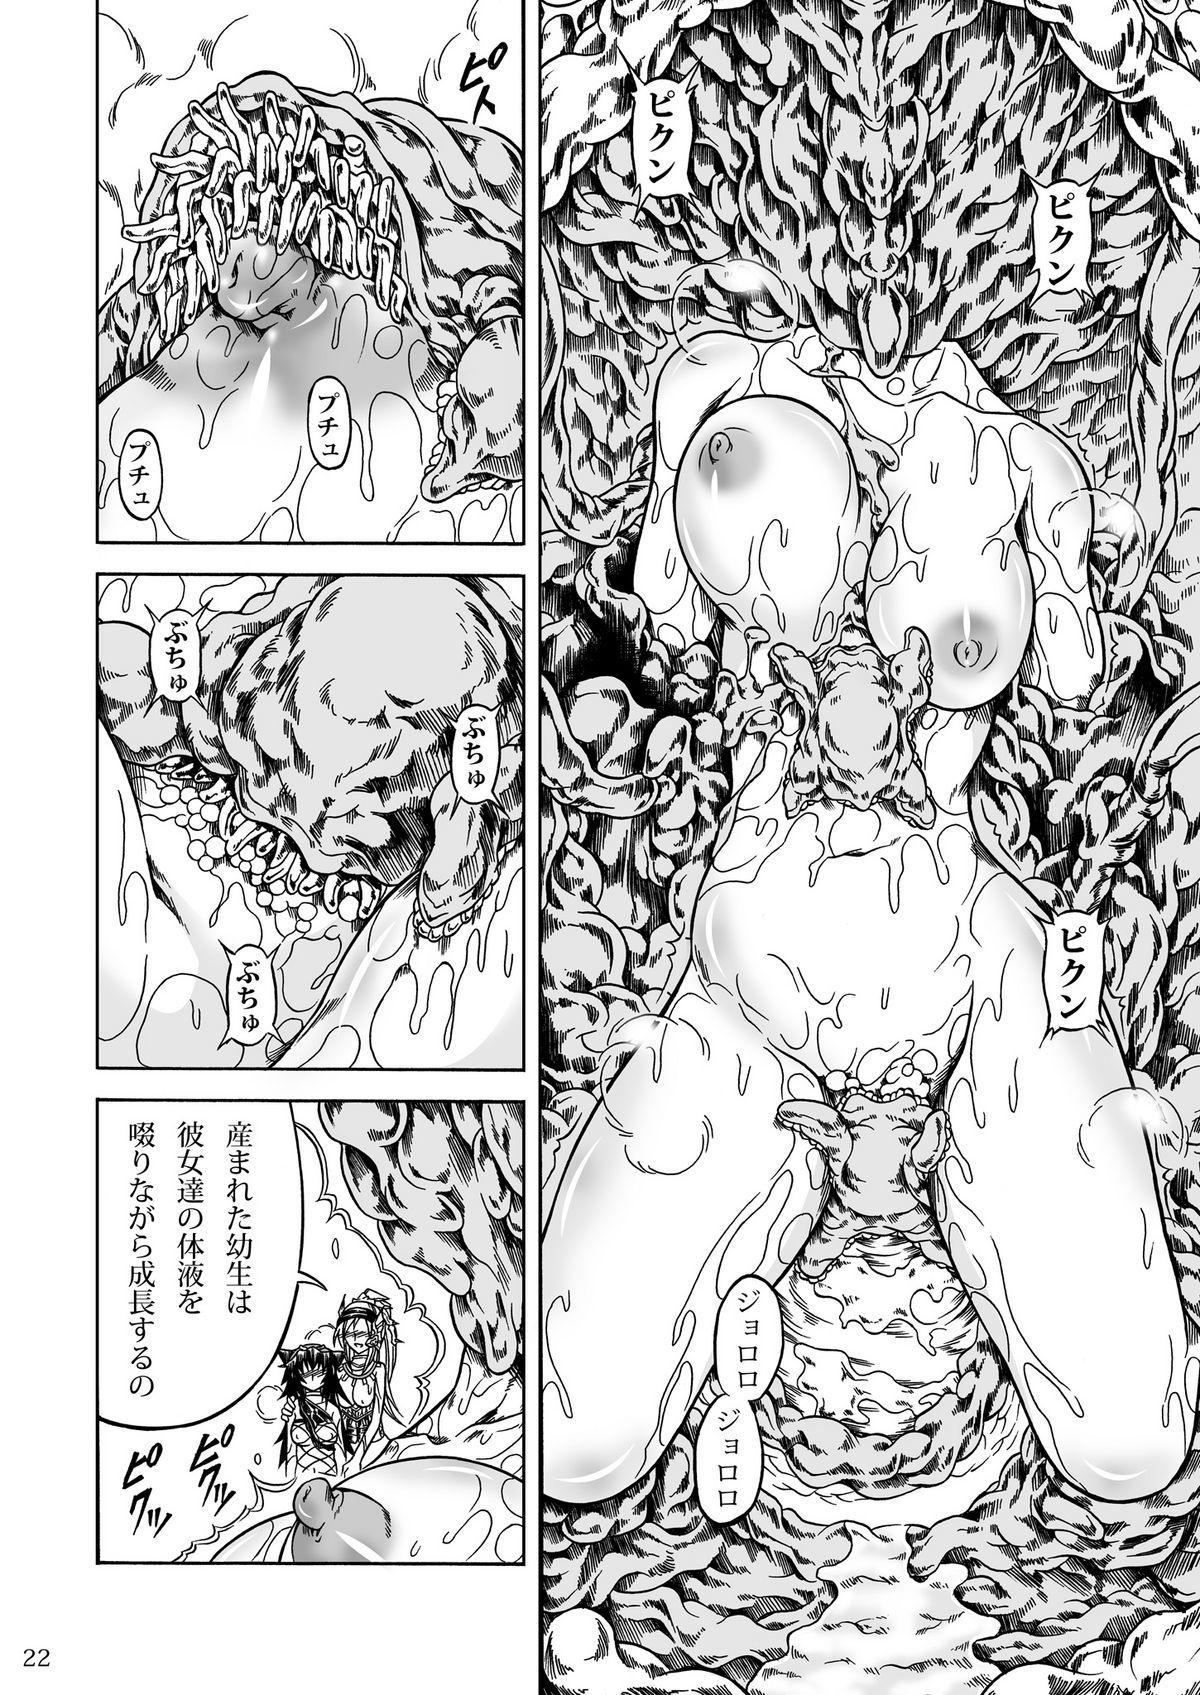 Solo Hunter no Seitai 2 The third part 21